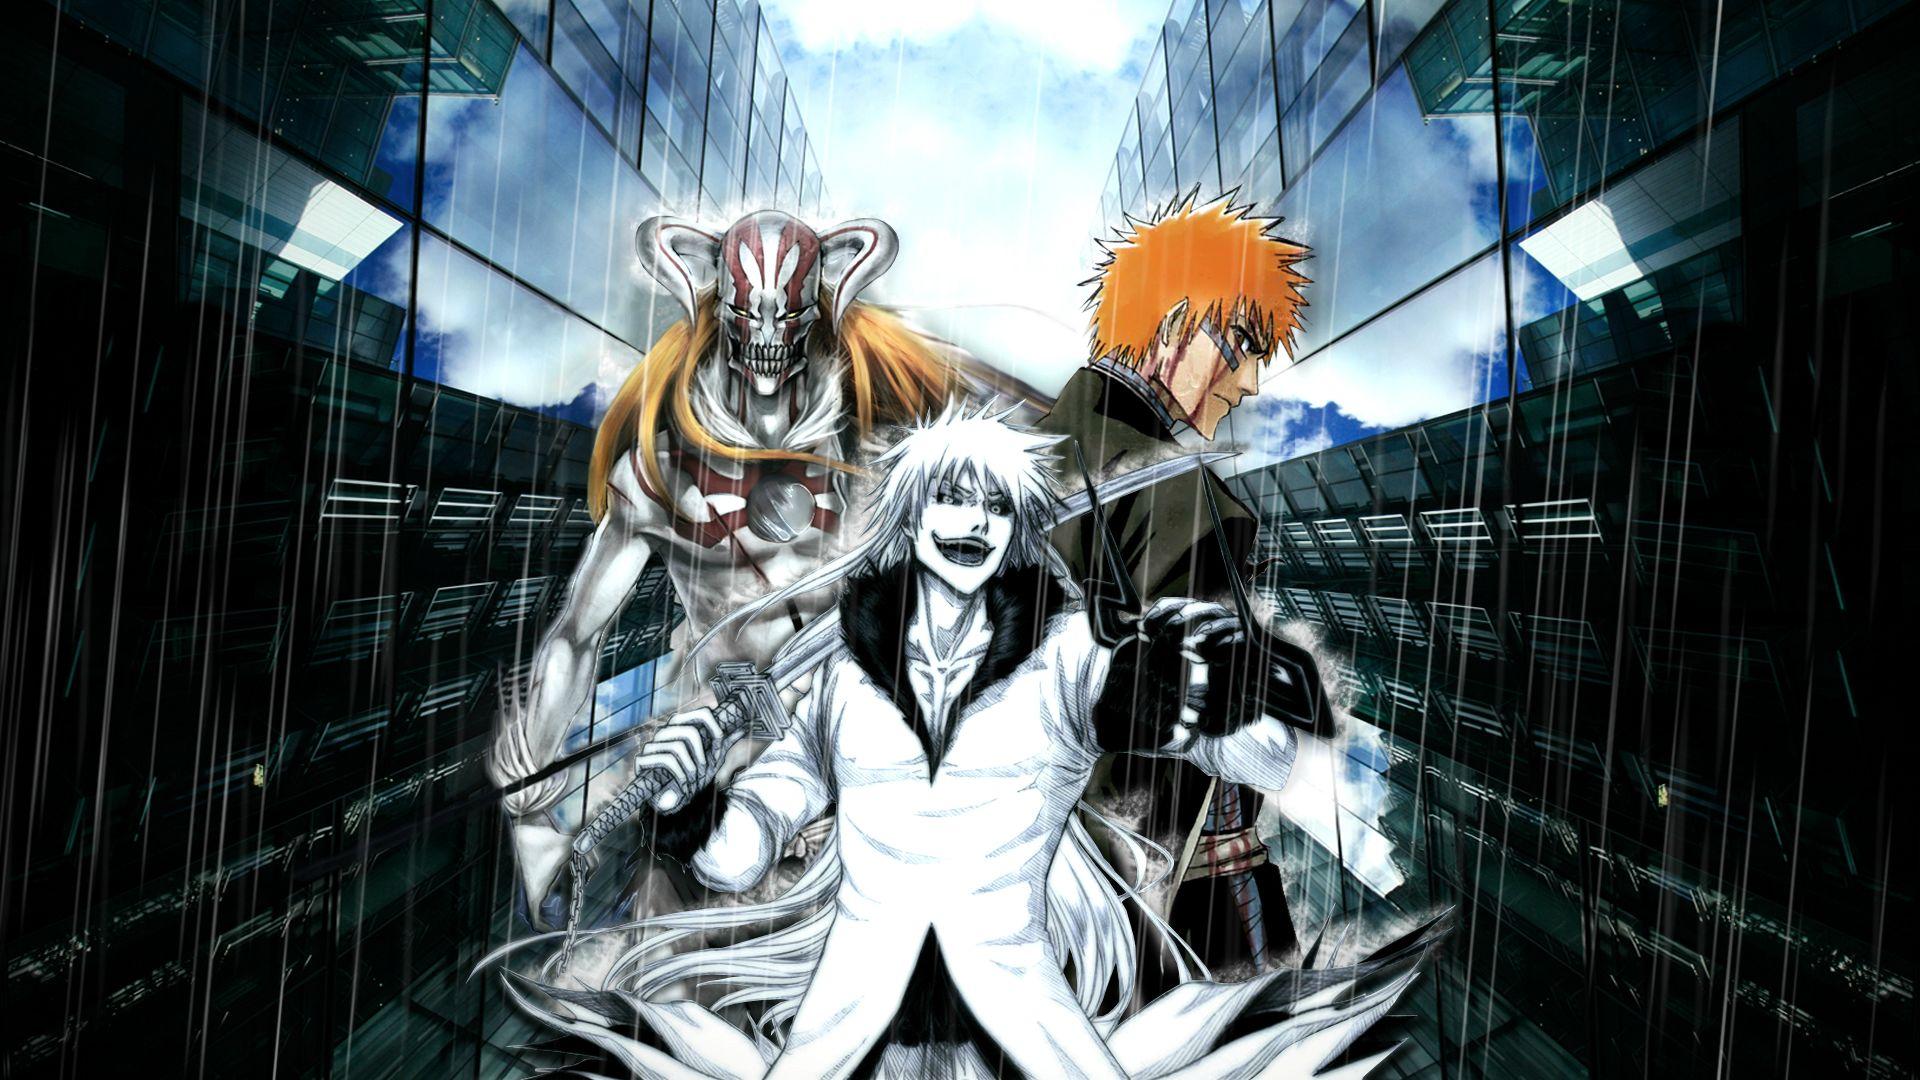 Bleach WallPapers Download Bleach WallPapers Anime Wallpaper